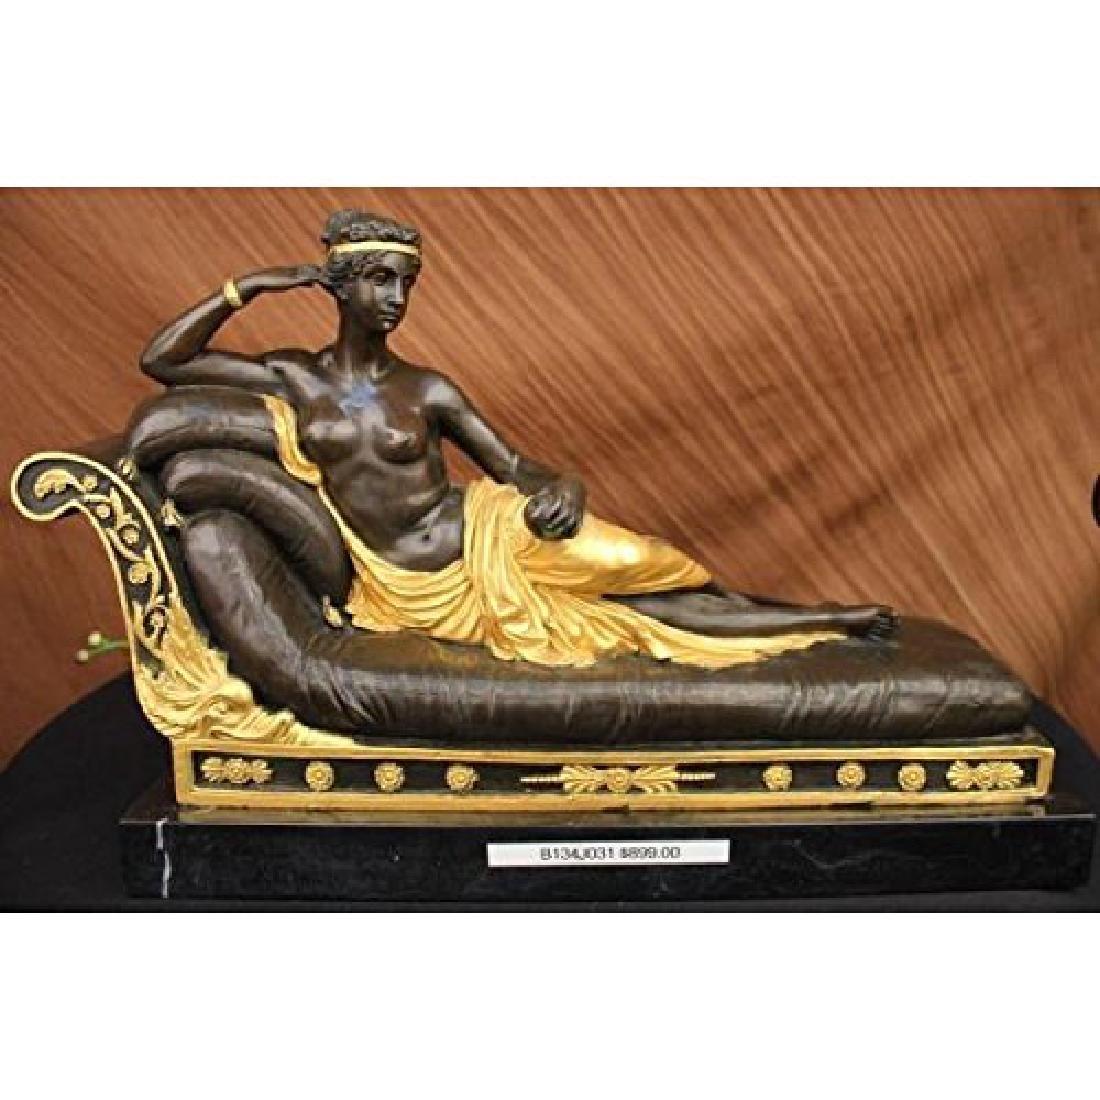 Nude Napoleon Sister Bronze Sculpture